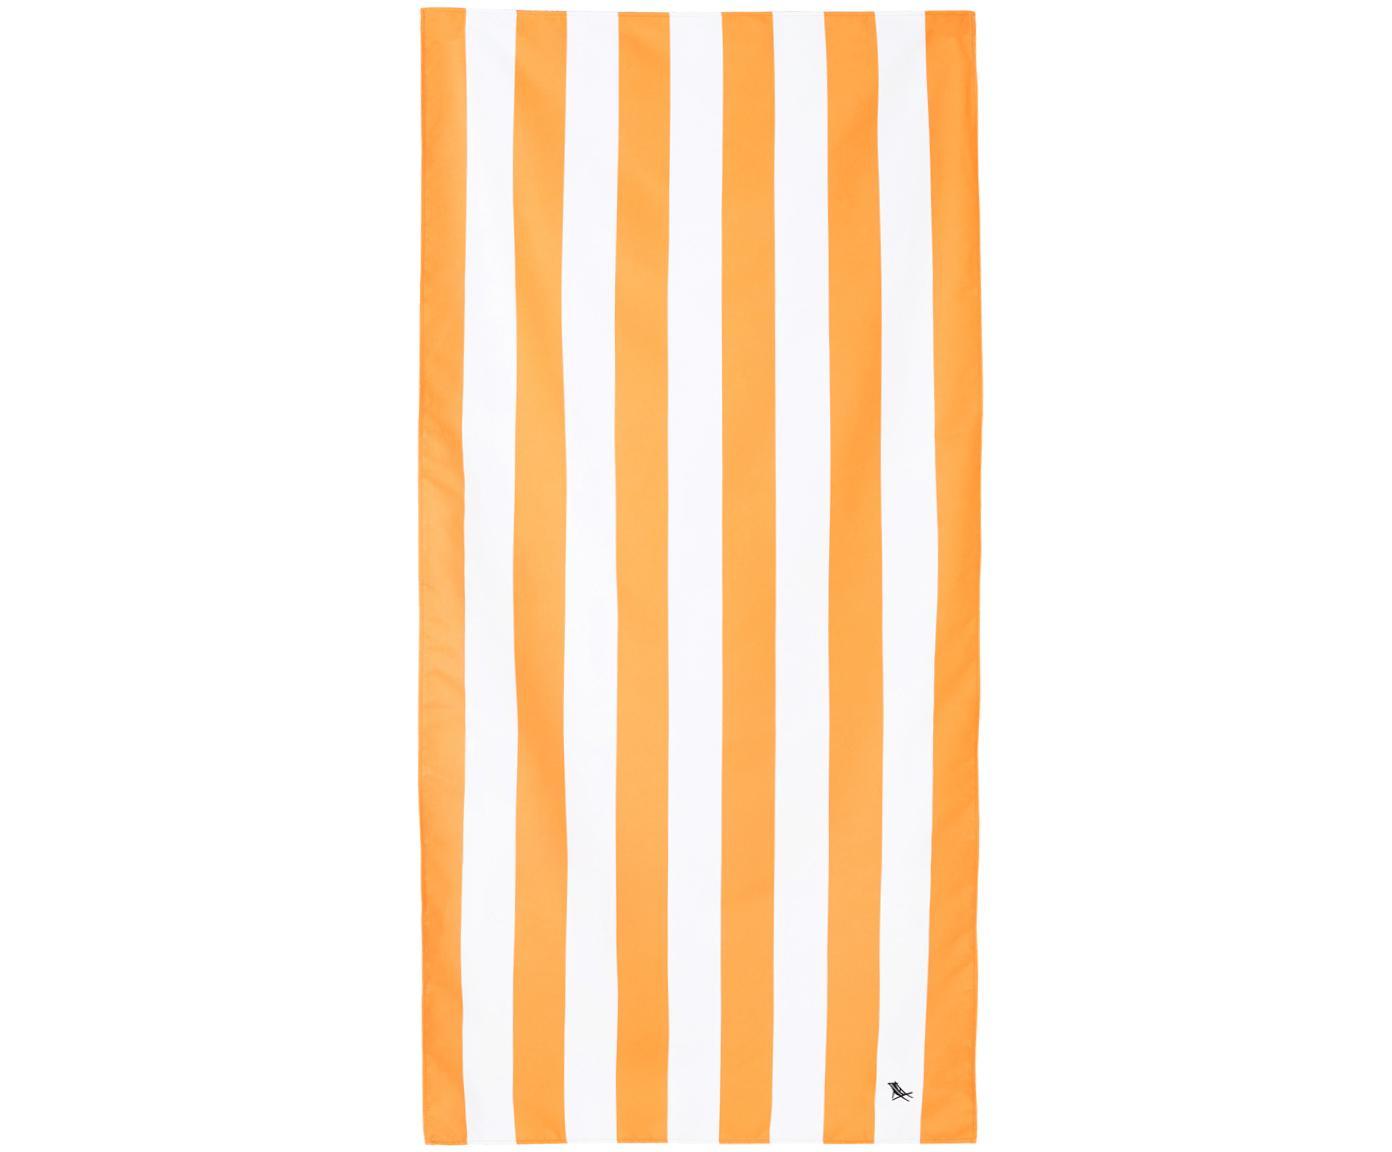 Telo mare in microfibra Cabana, asciugatura rapida, Microfibra (80% poliestere, 20% poliammide), Arancione, bianco, Larg. 90 x Lung. 200 cm